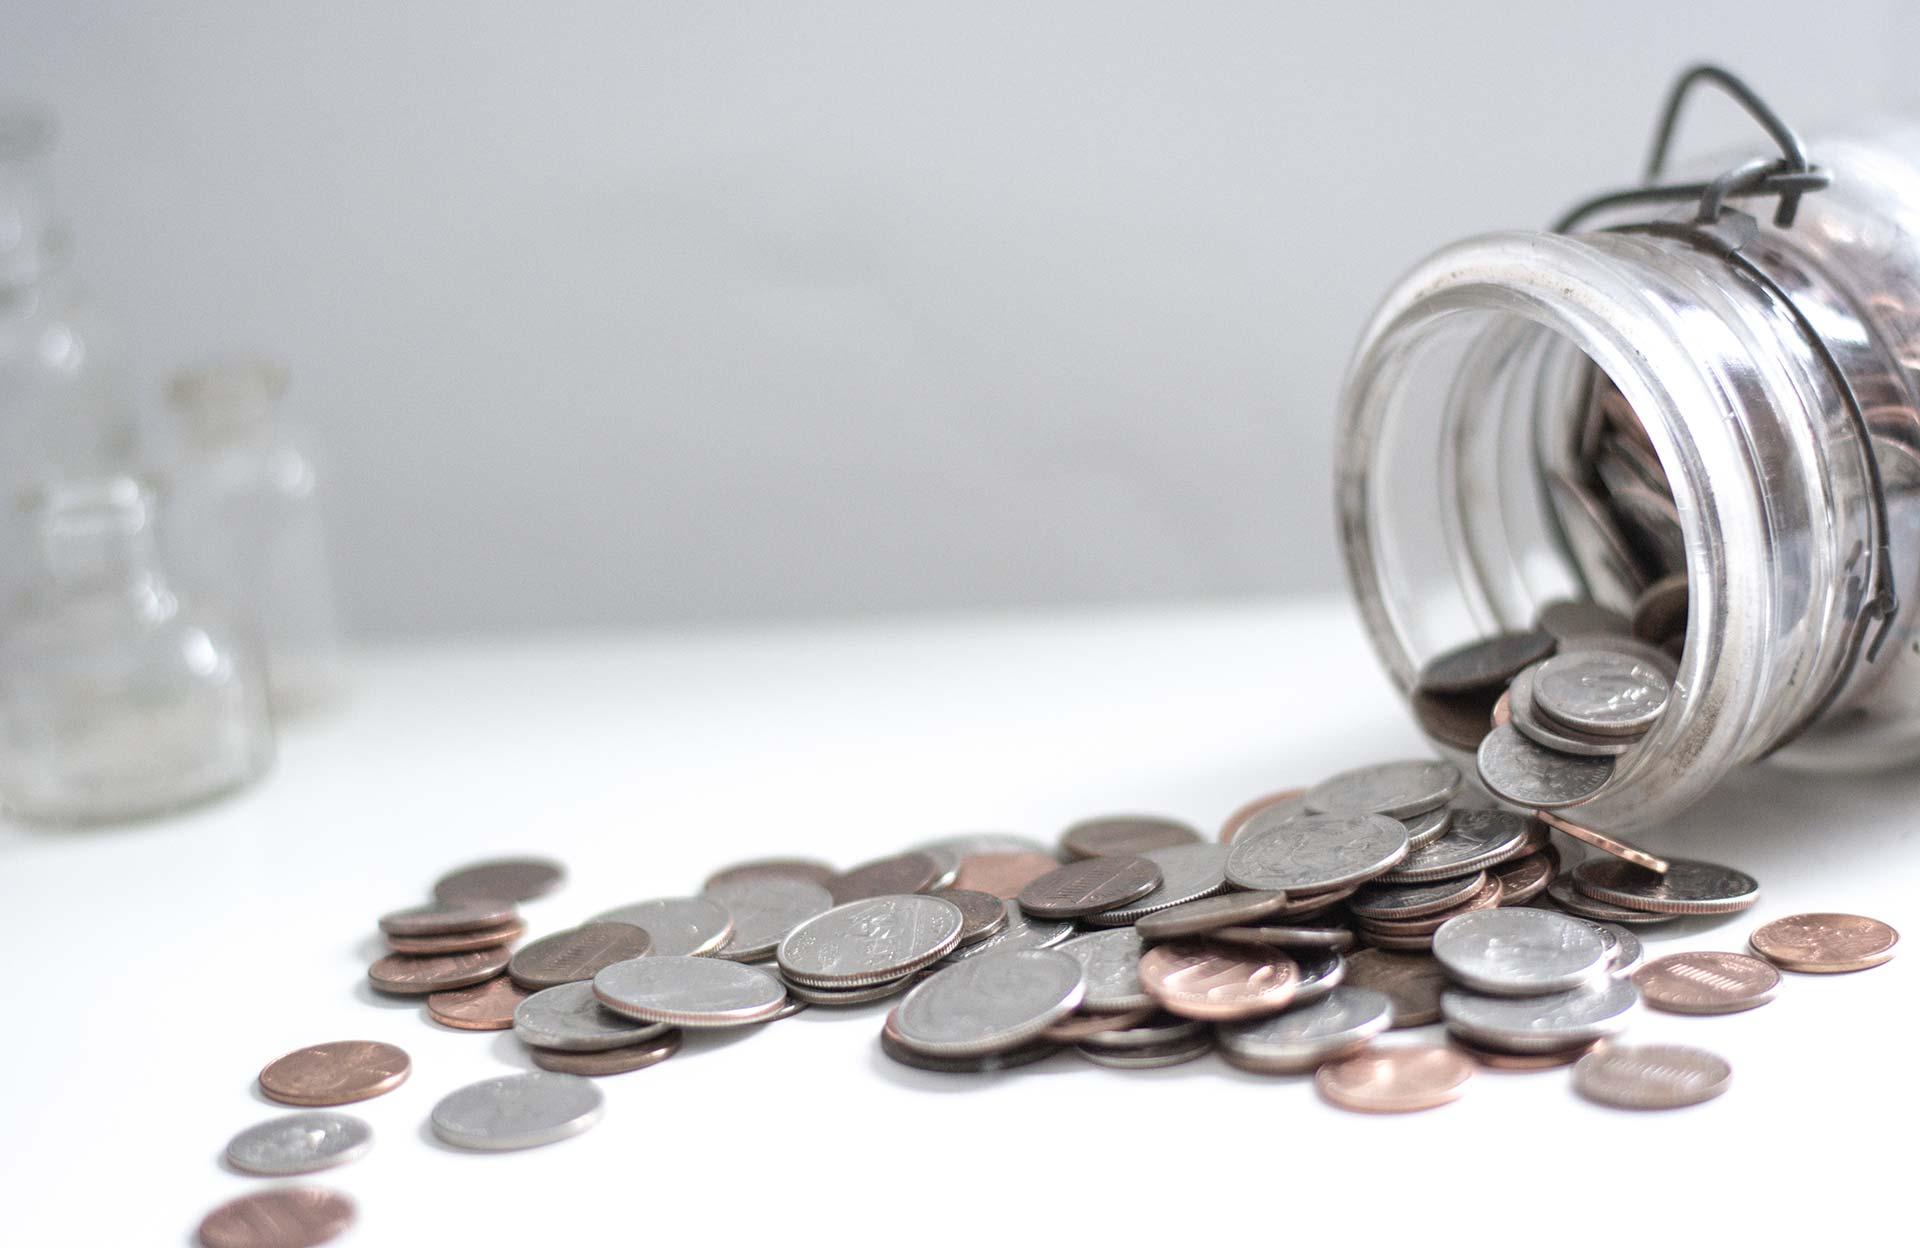 cash glass jar